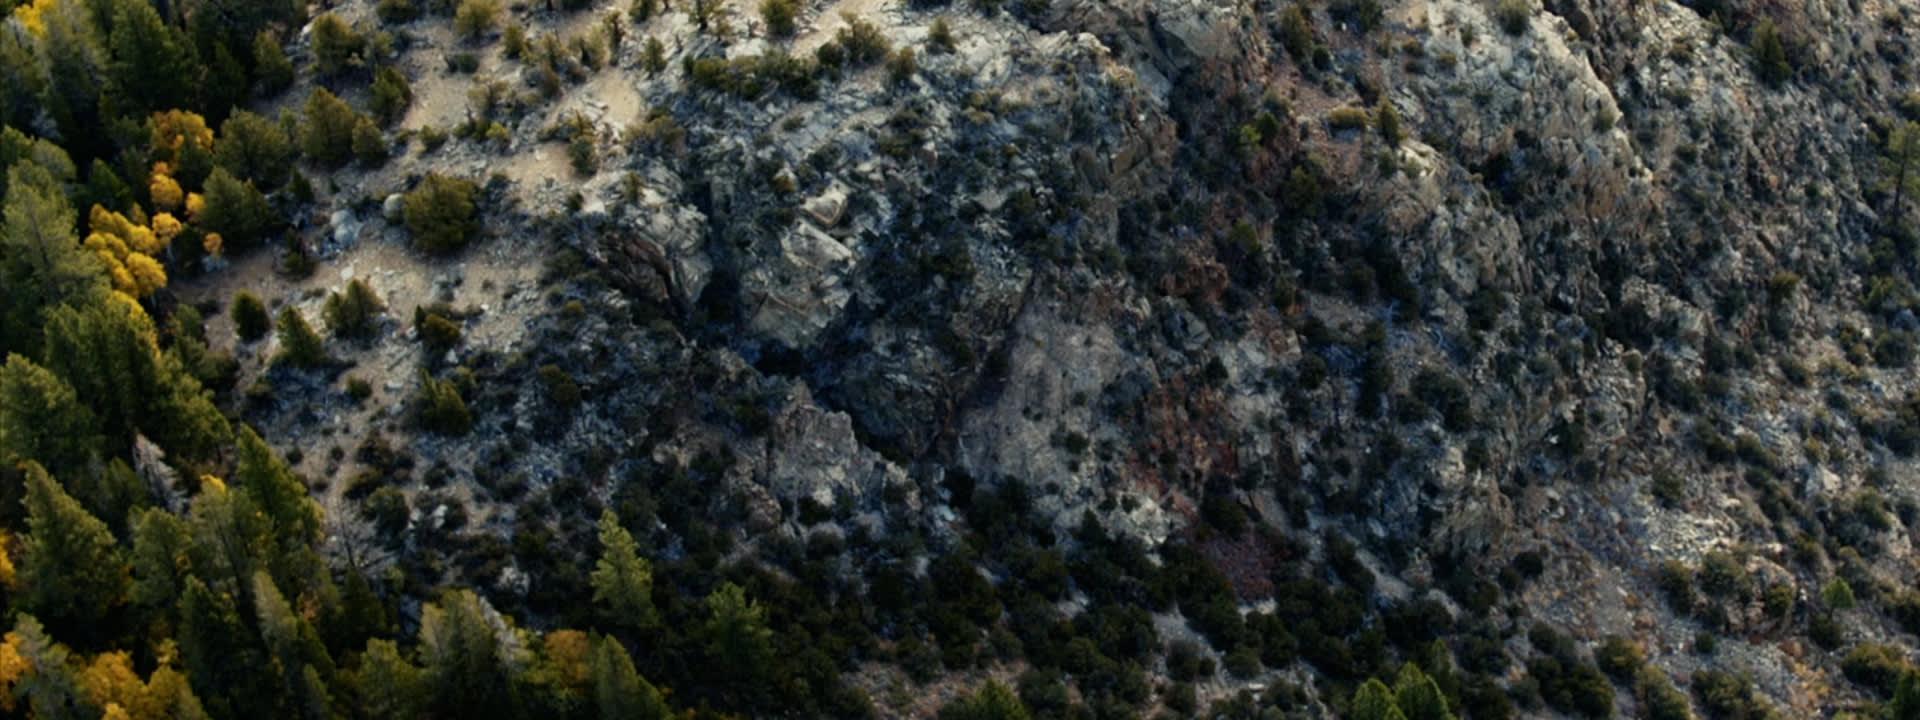 adidas Outdoor: hiking, trail running, climbing, MTB gear